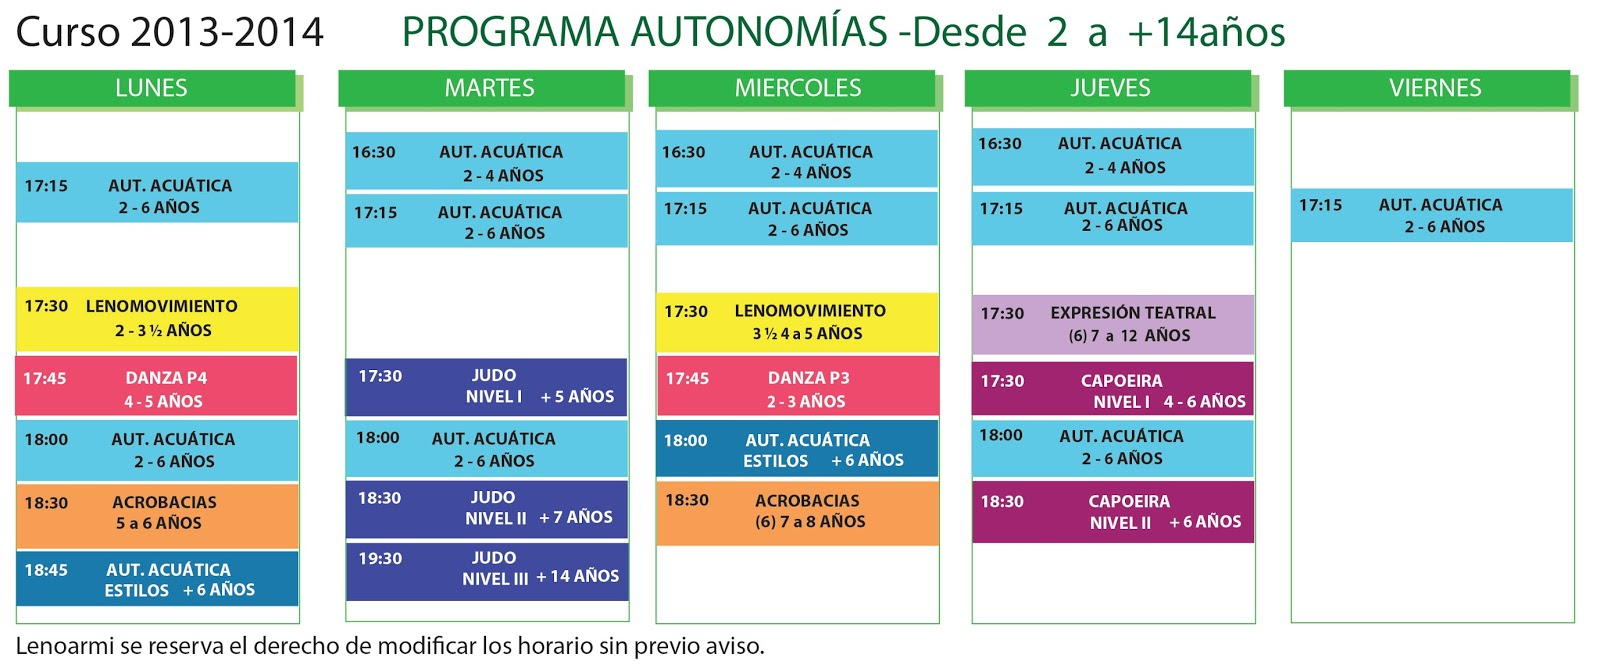 Lenoarmi Blog: HORARIOS DE ACTIVIDADES DEL CURSO 2013-2014